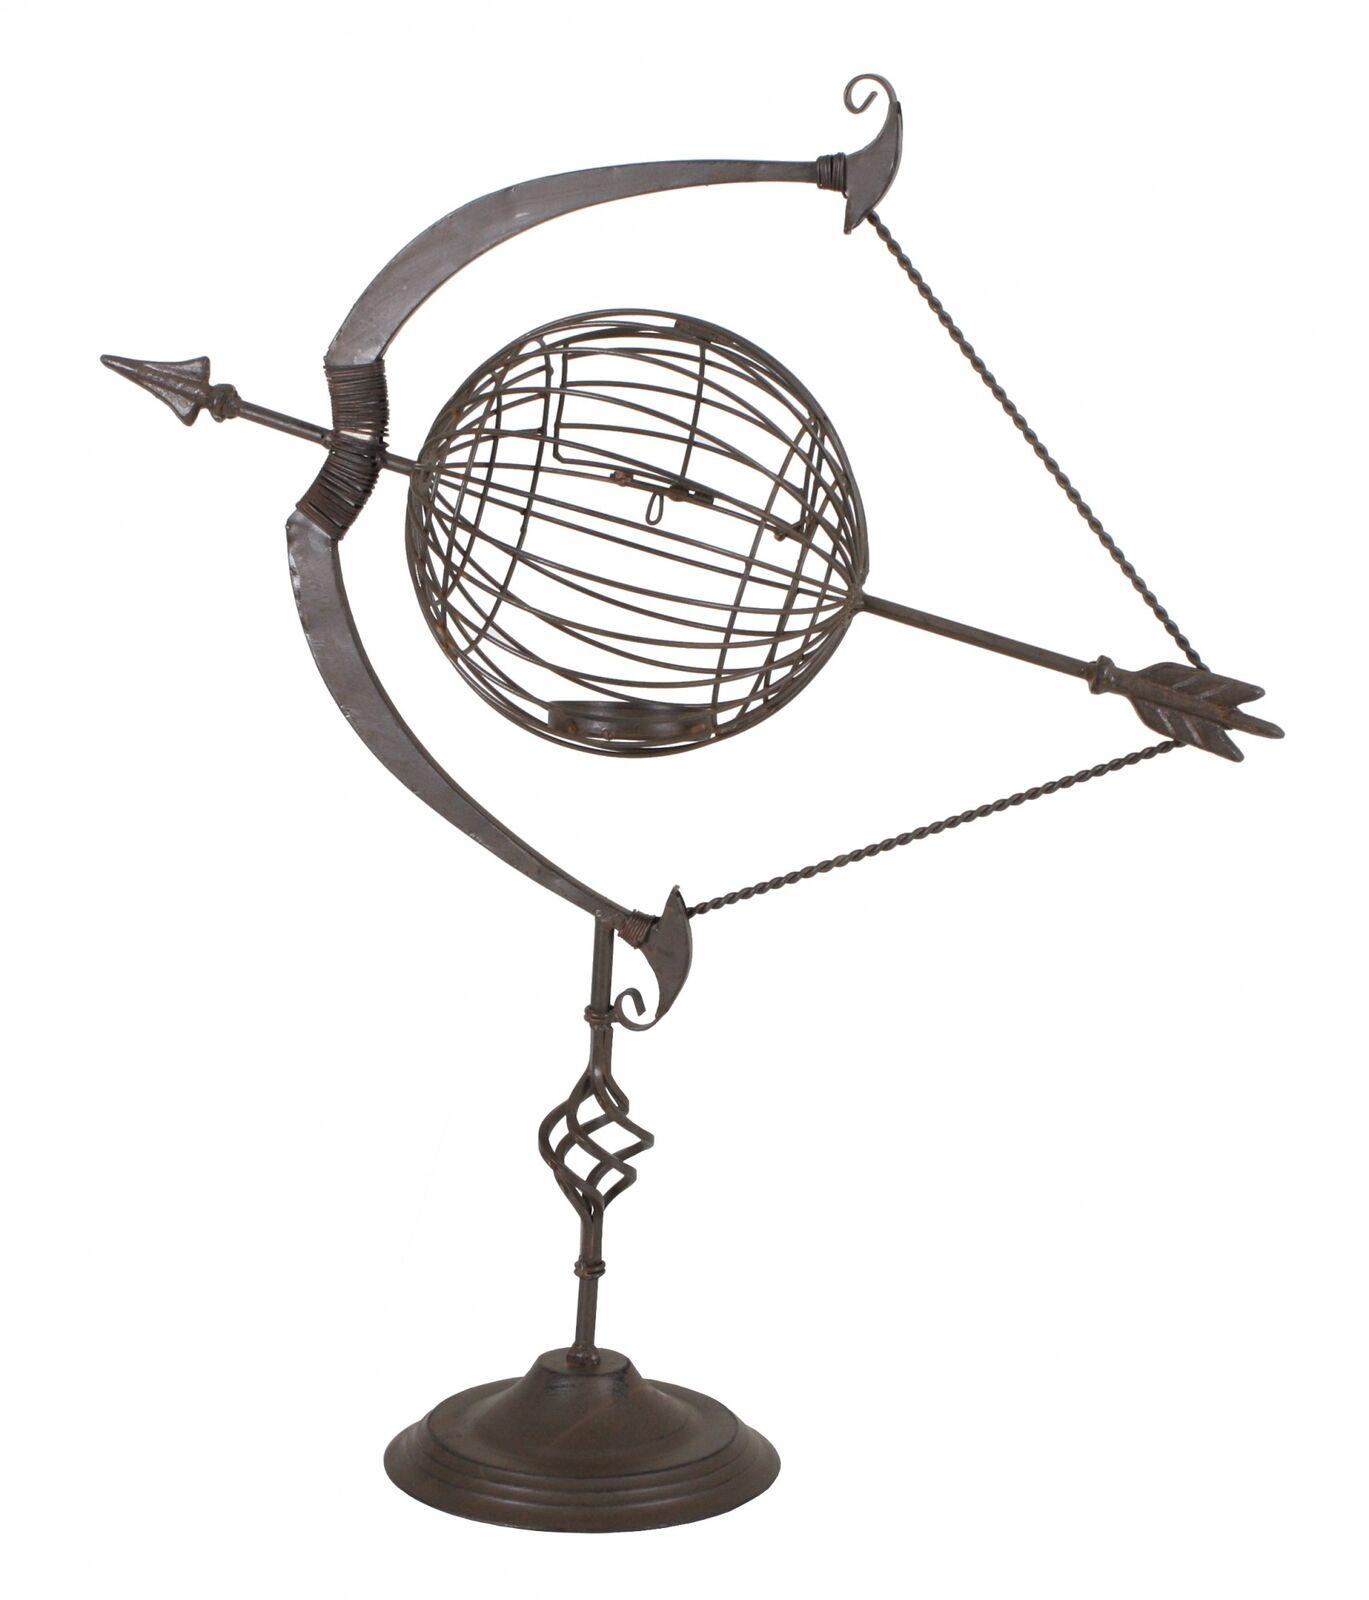 Sonnenuhr Gartendeko Garten Uhr Gartenuhr Gartenskulptur Sonne Gartenfigur | Fairer Preis  | Günstigstes  | Langfristiger Ruf